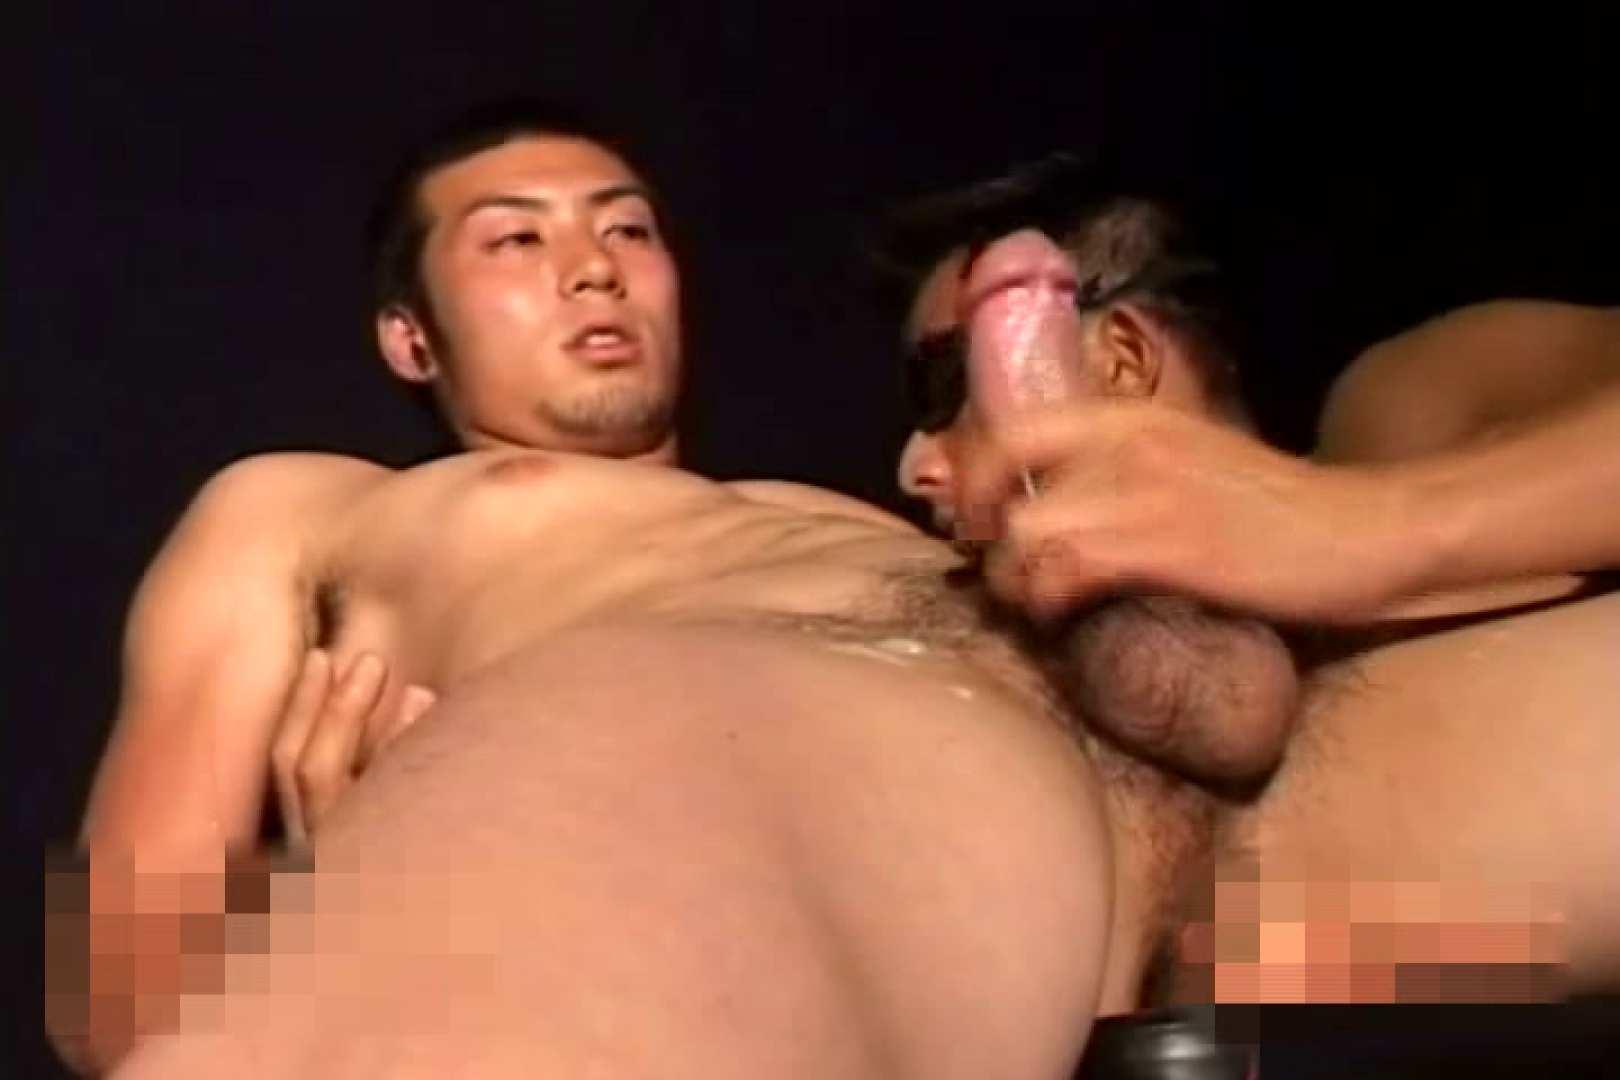 Beautiful muscle モッコリ野郎達!Vol.04 フェラDE絶頂 | イケメンのsex  103pic 12